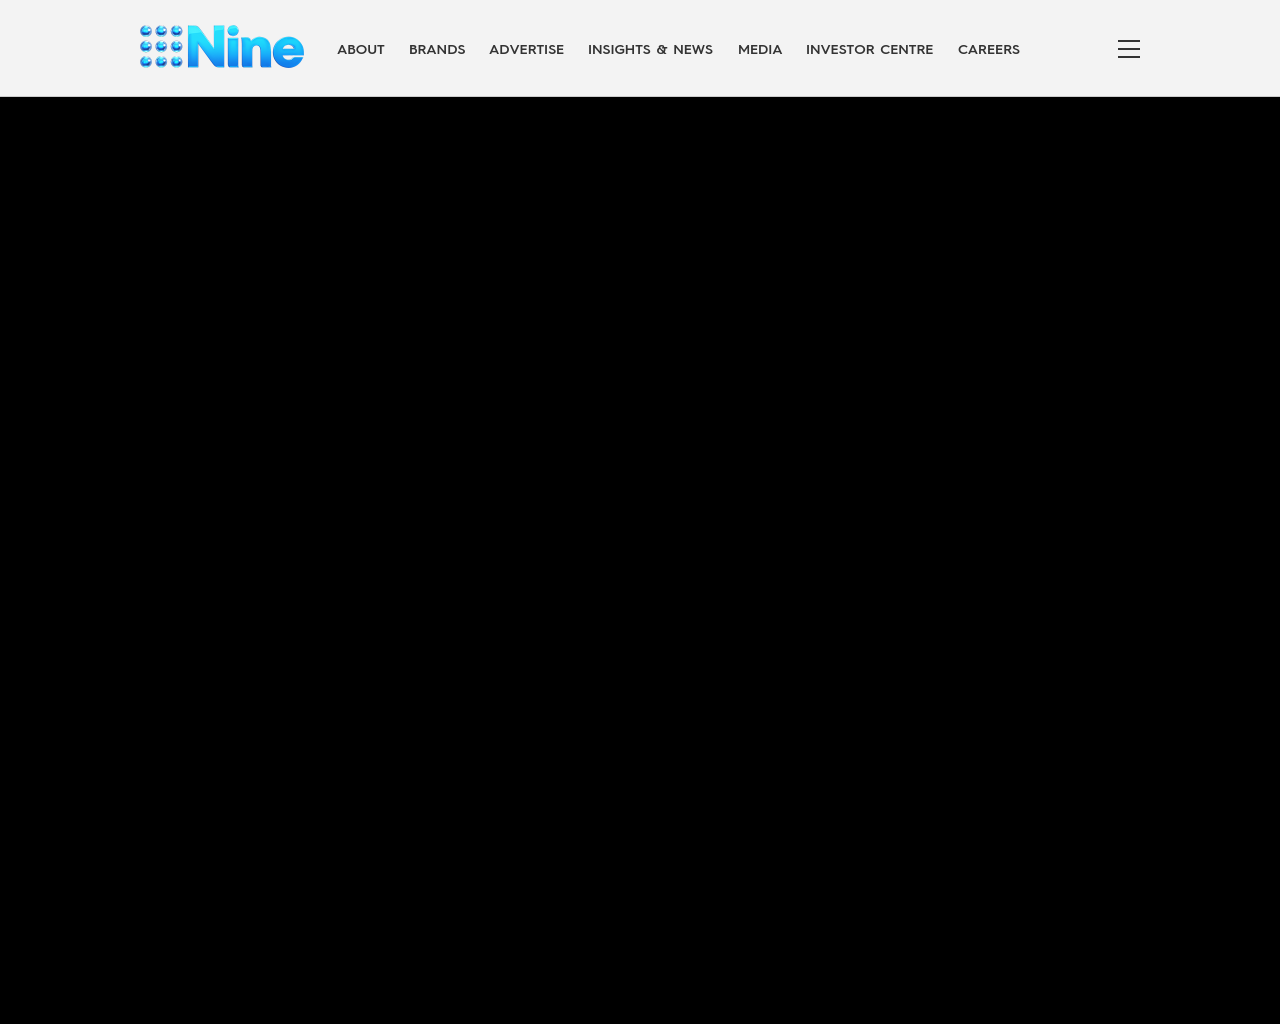 Mi9-Advertising-Reviews-Pricing